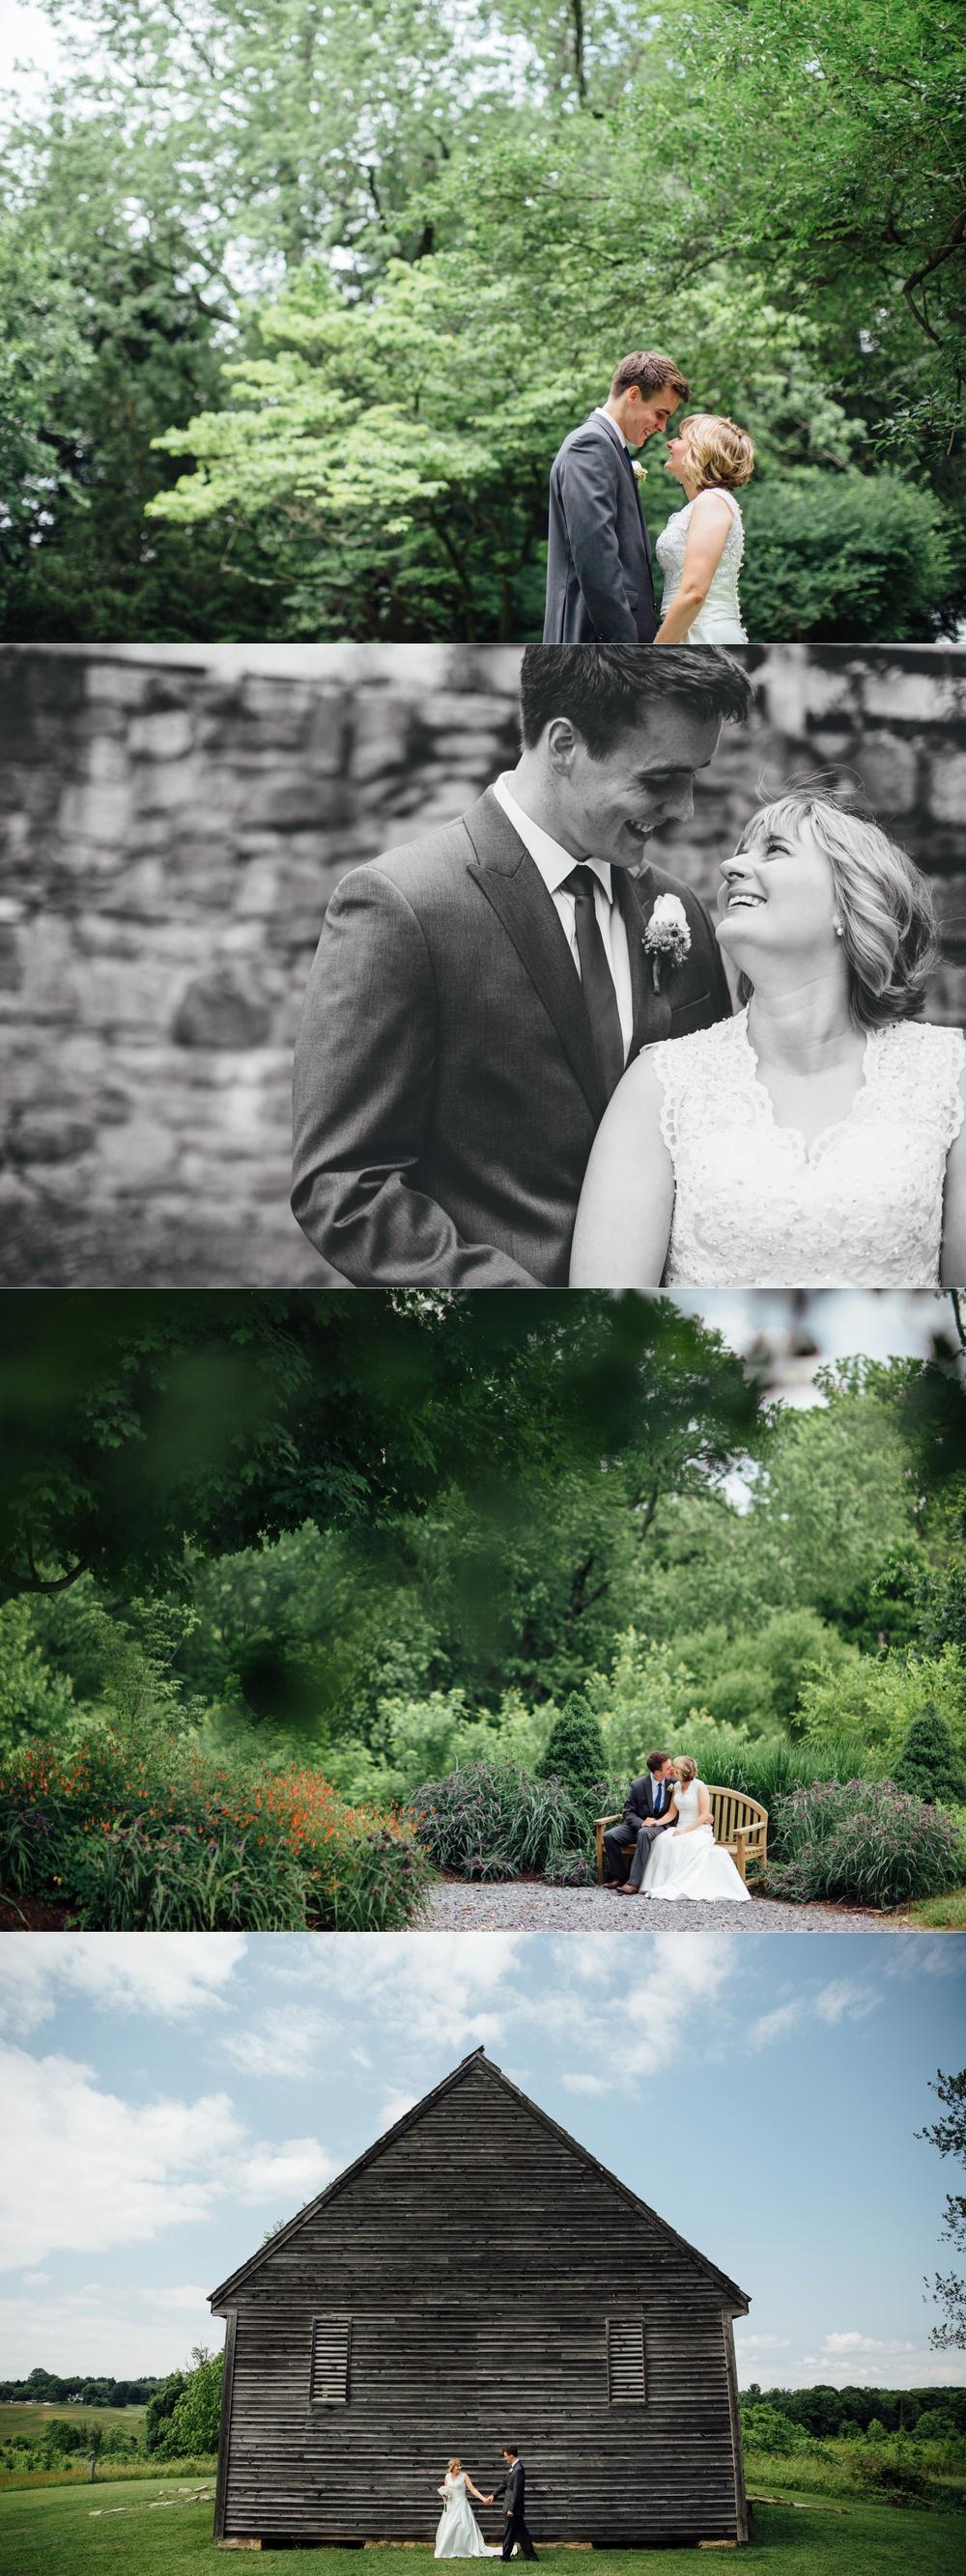 jake-and-katie-wedding-favorites-2015-38